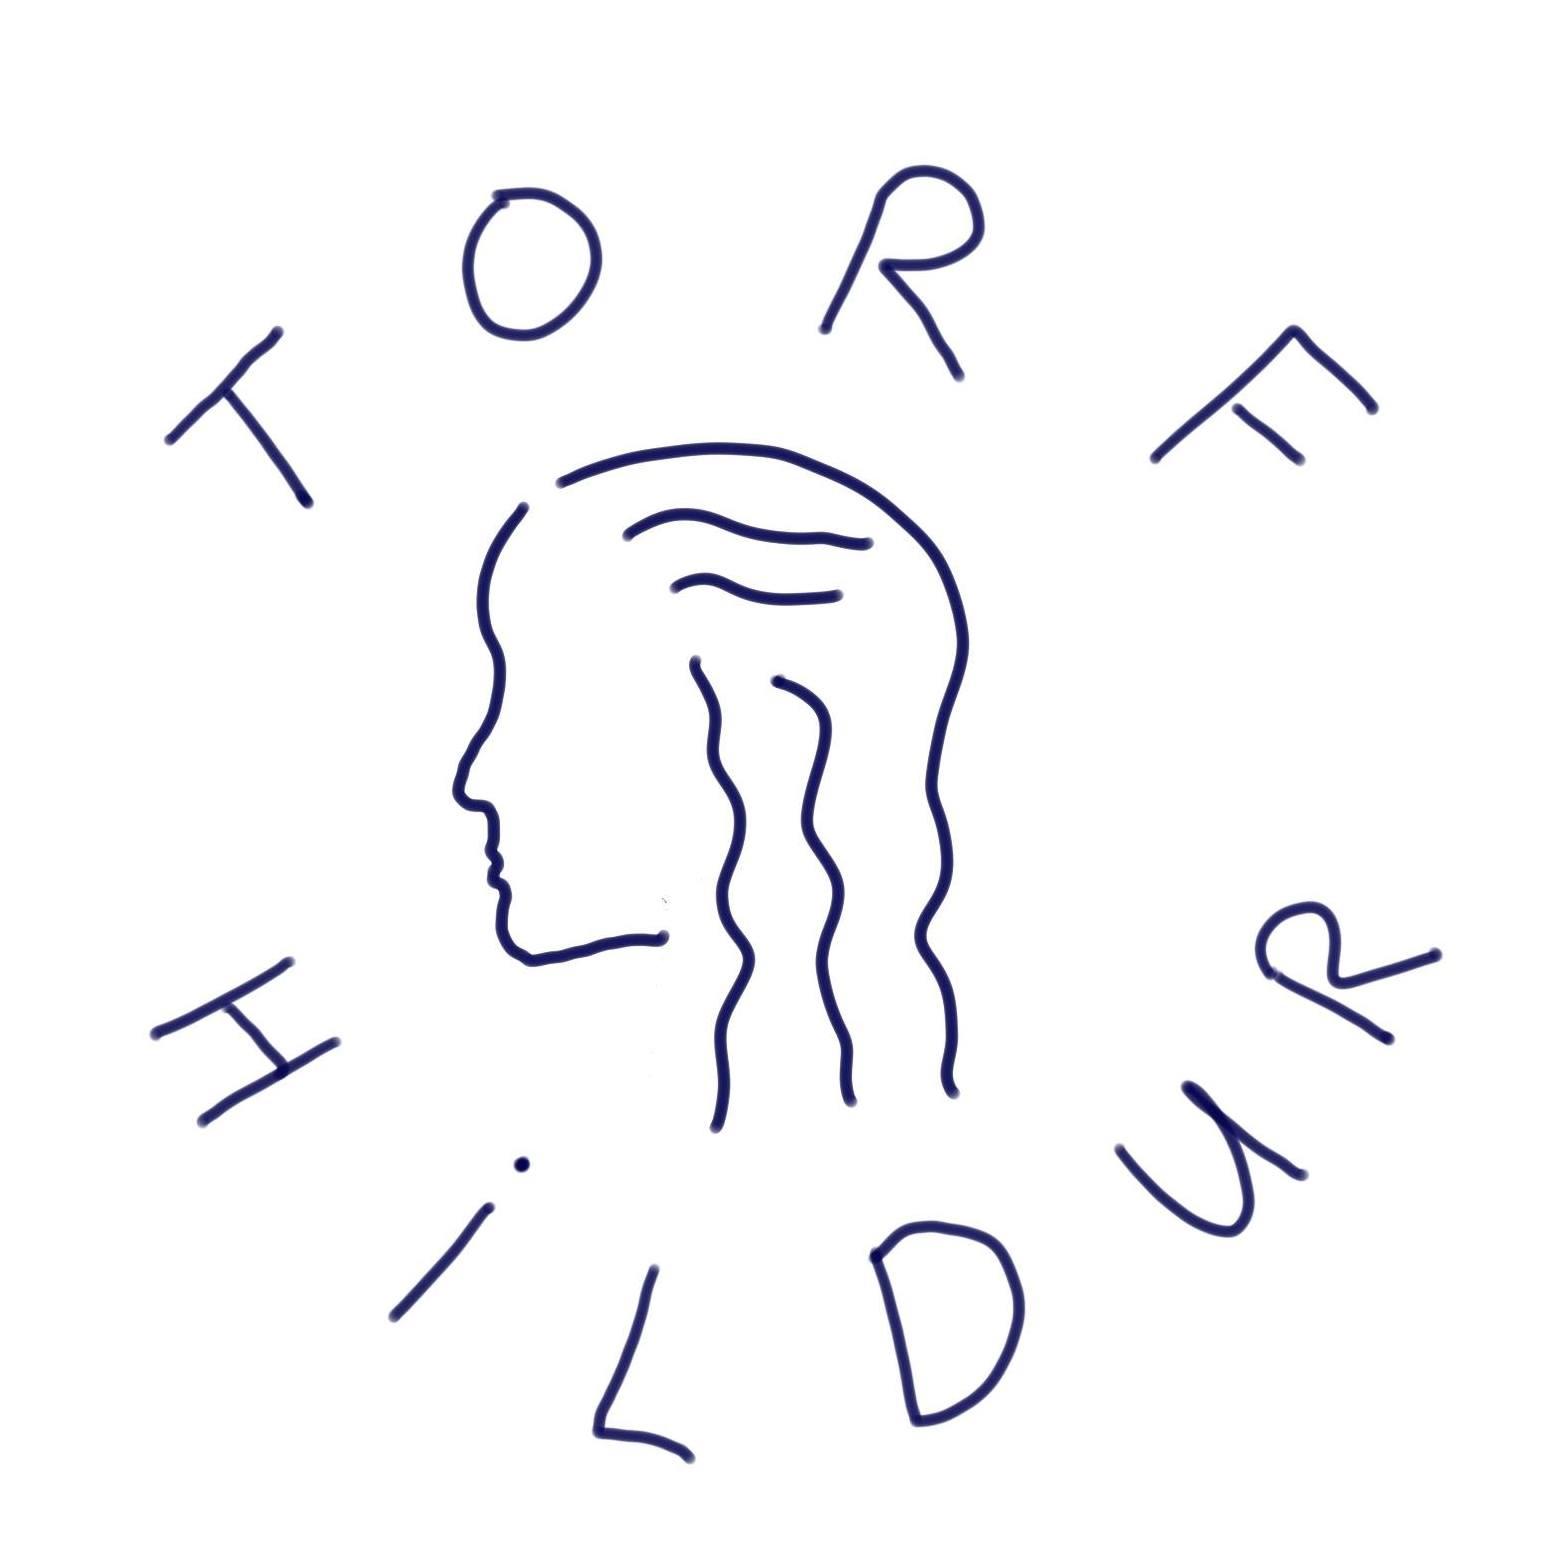 Torfhildur, literary studies